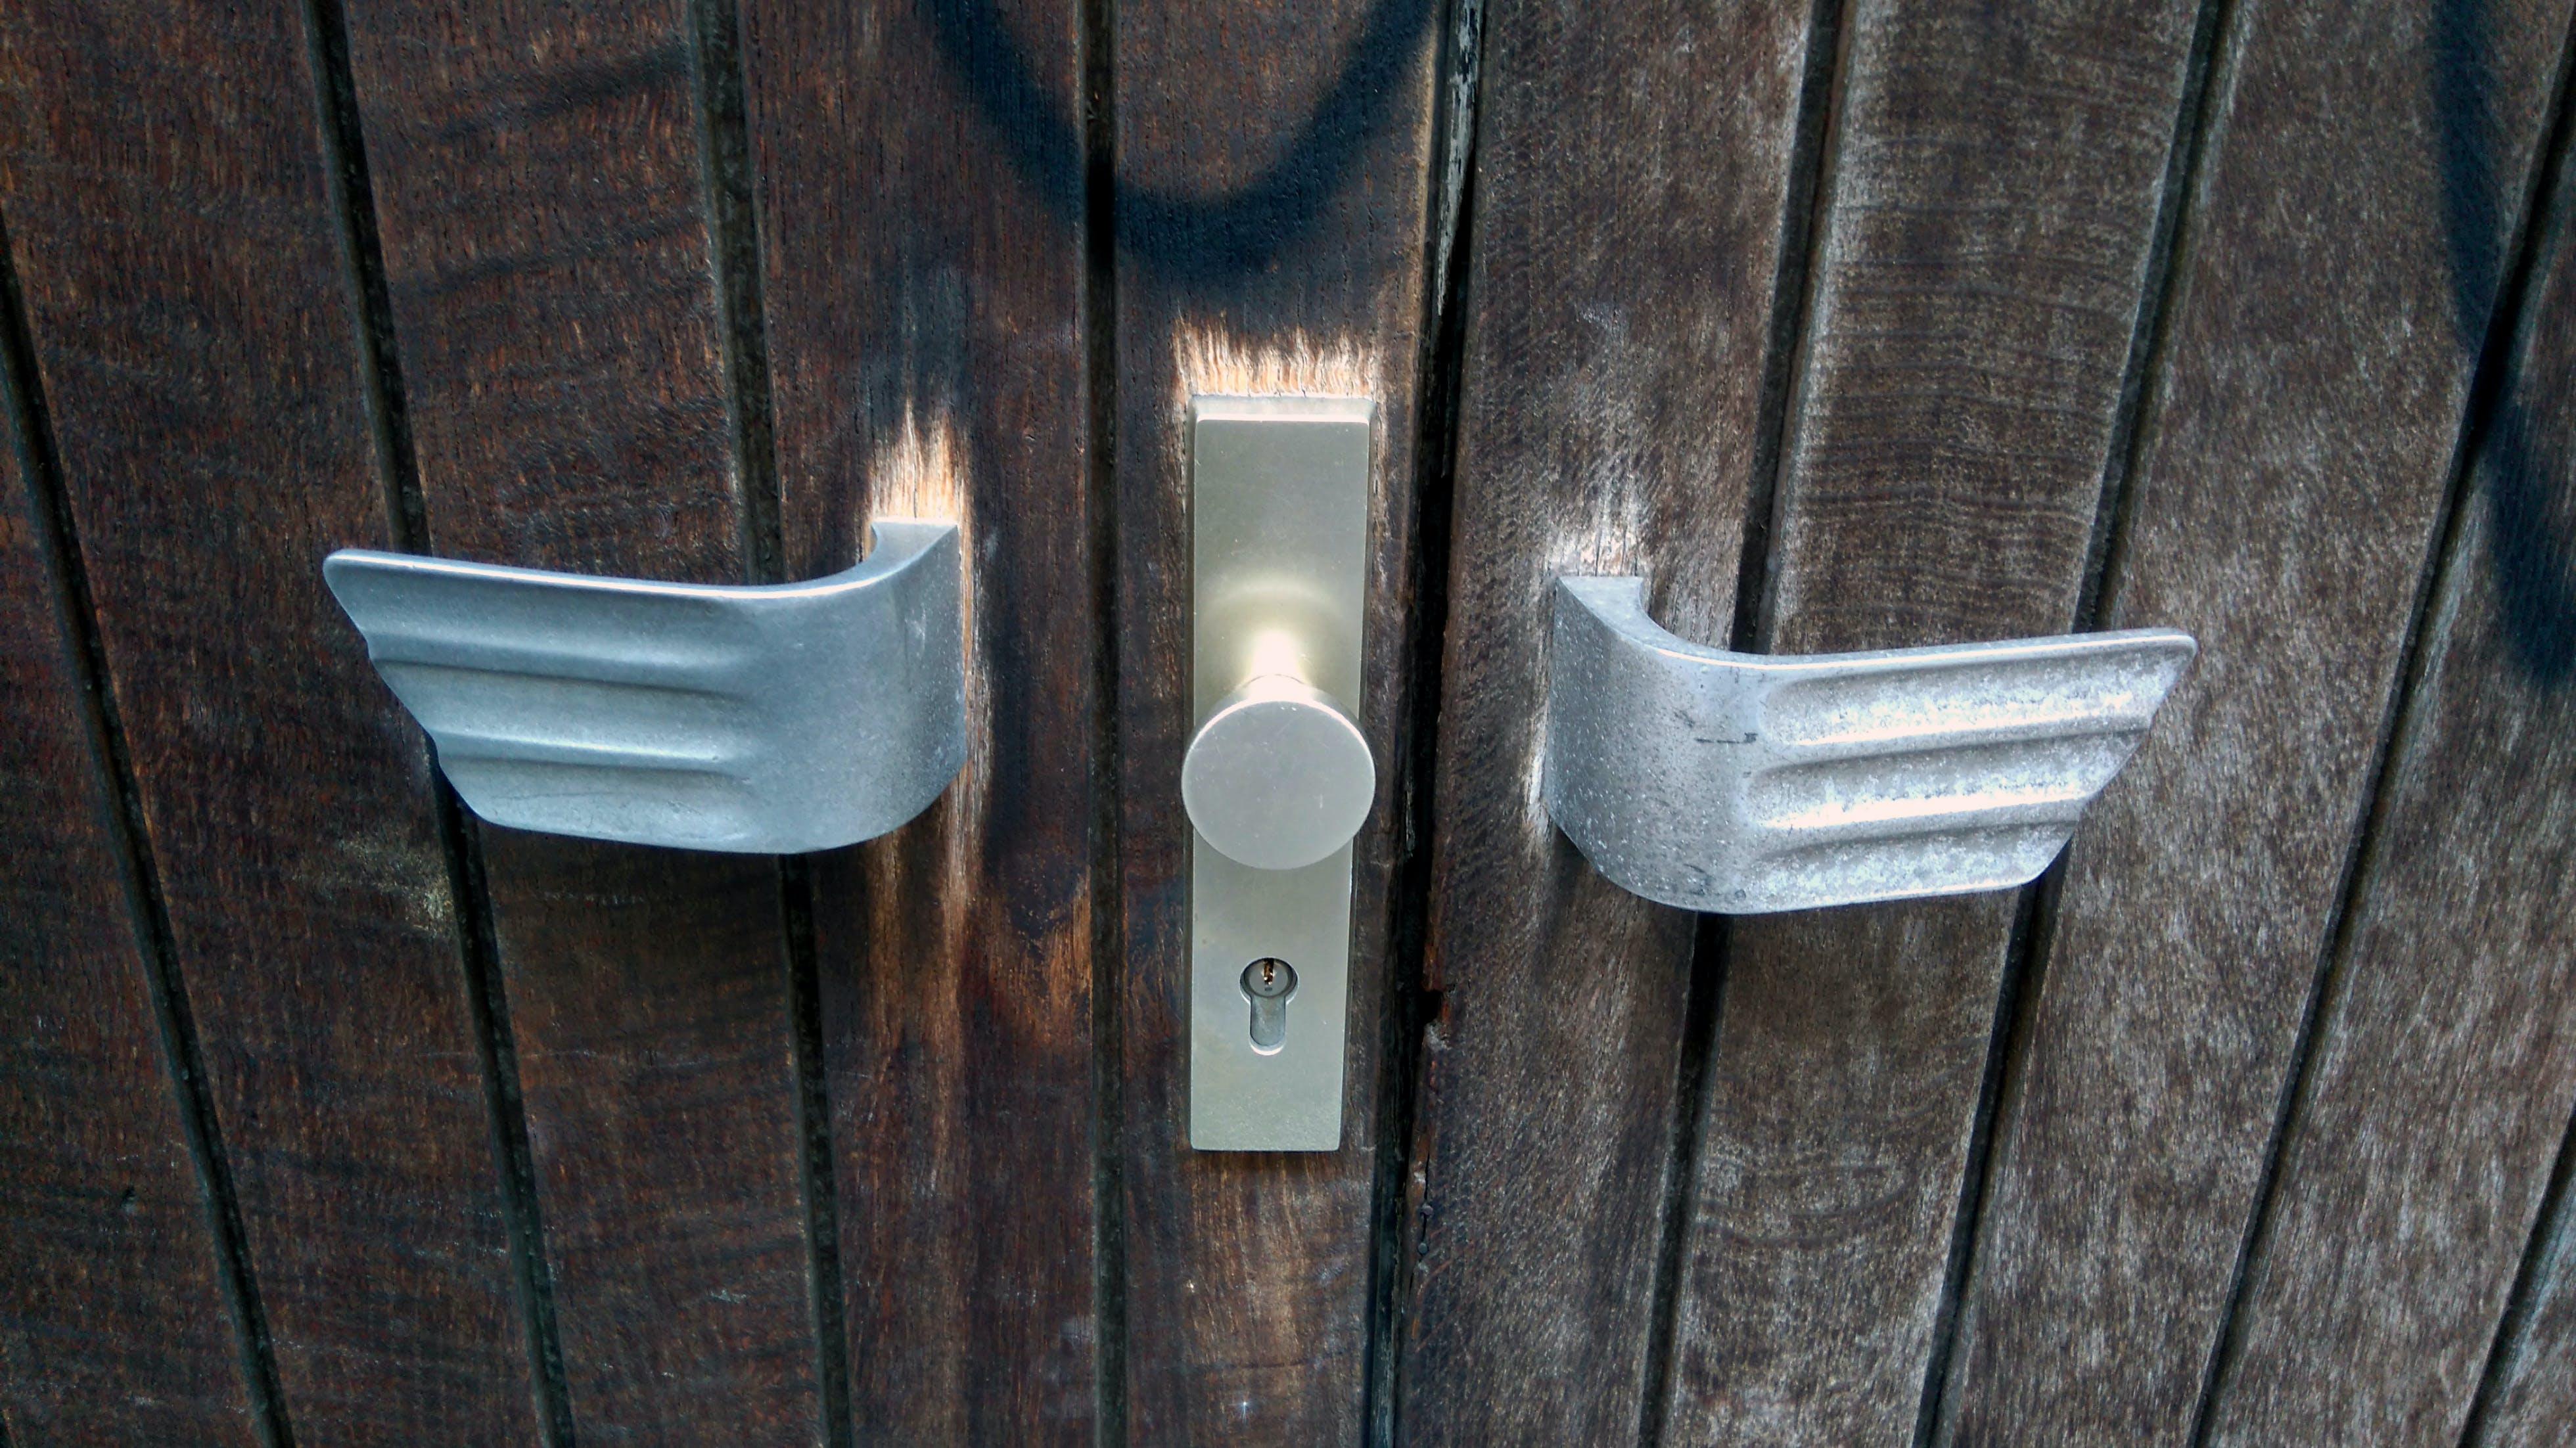 Free stock photo of lock, locked, wien, wooden doors